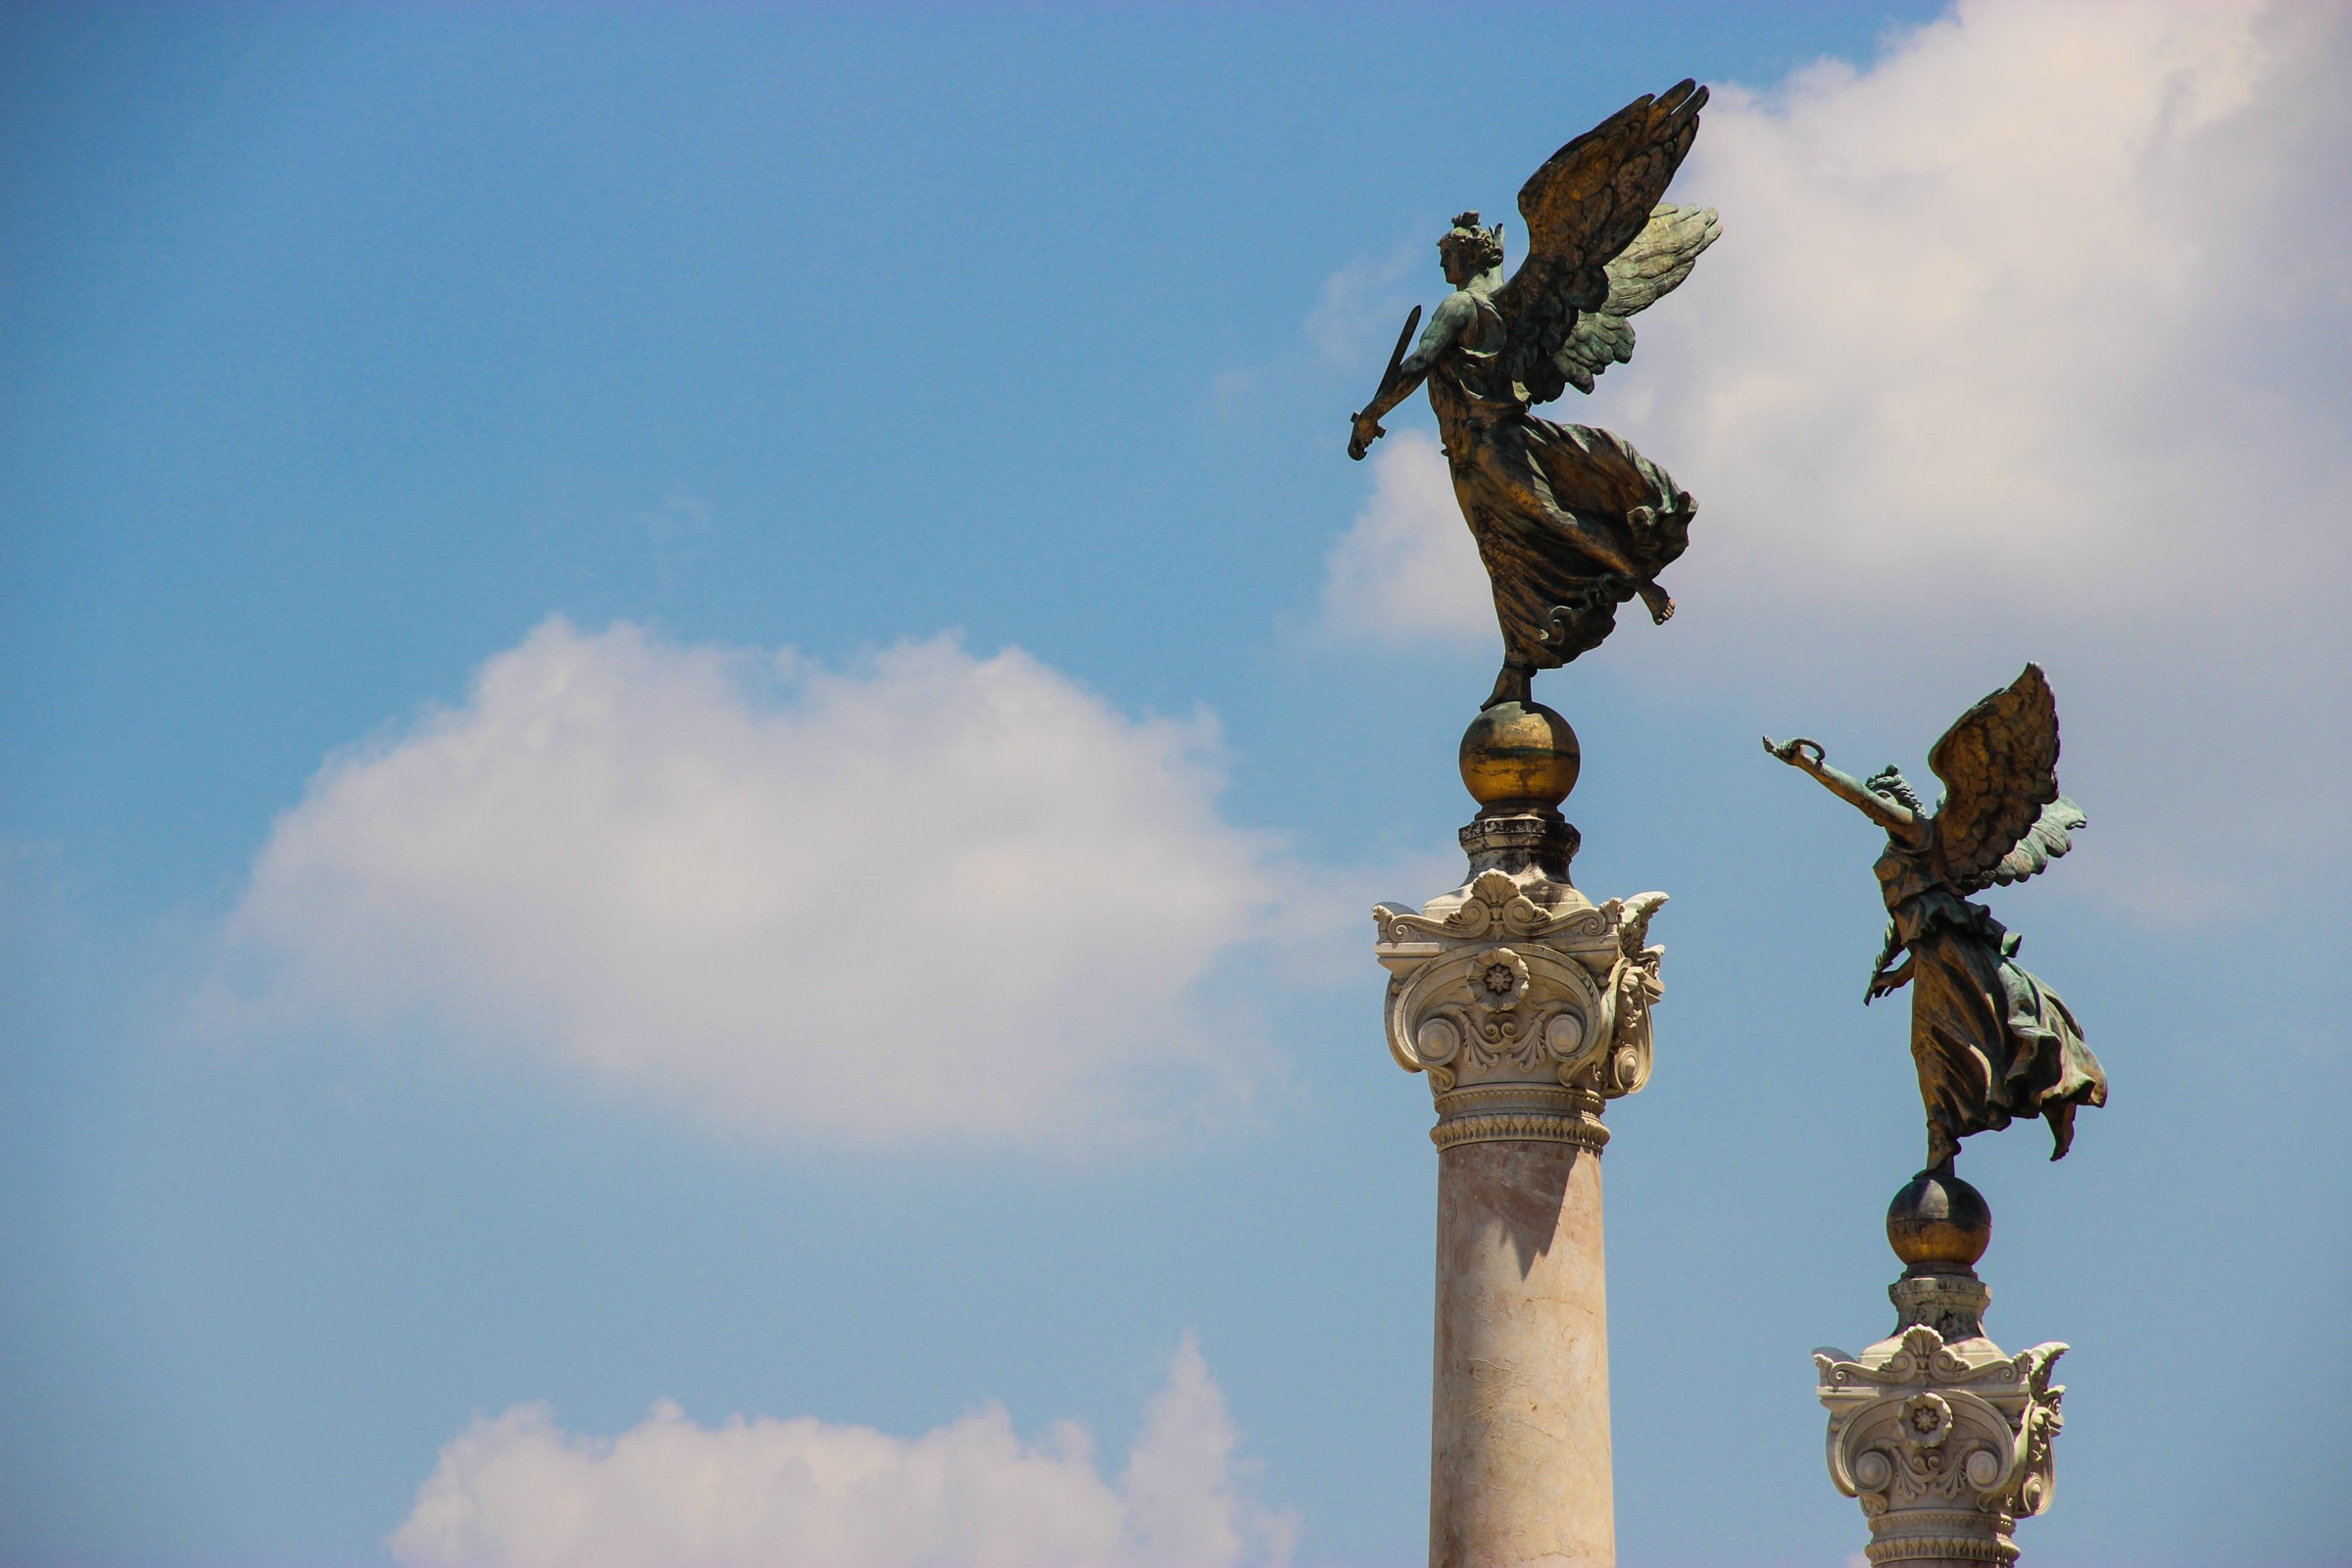 Bronze Winged Statues On Pillars